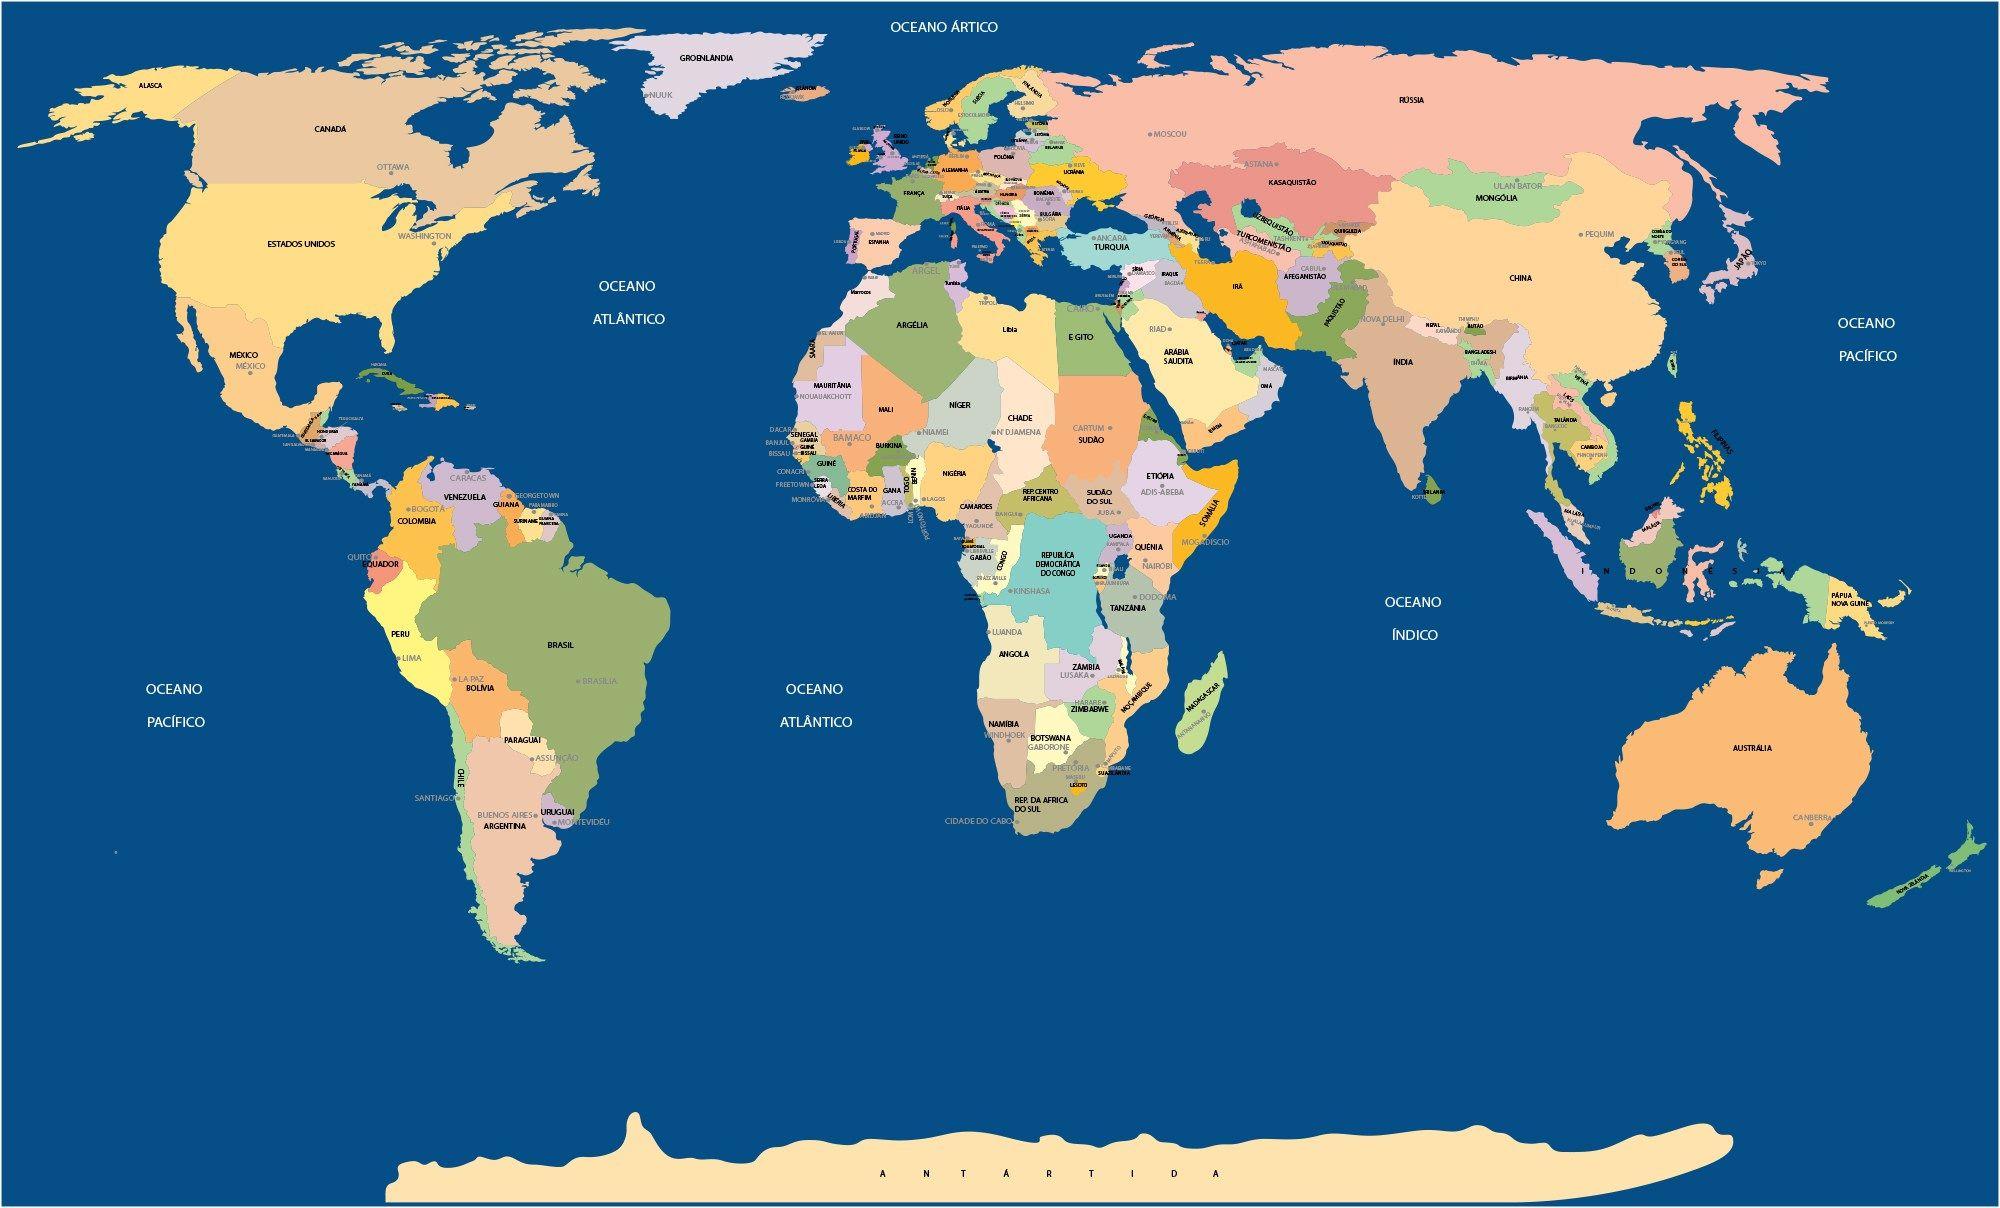 Pin De Tania Souza Em Mapas Mapa Mundi Quadros Mapa Mundi